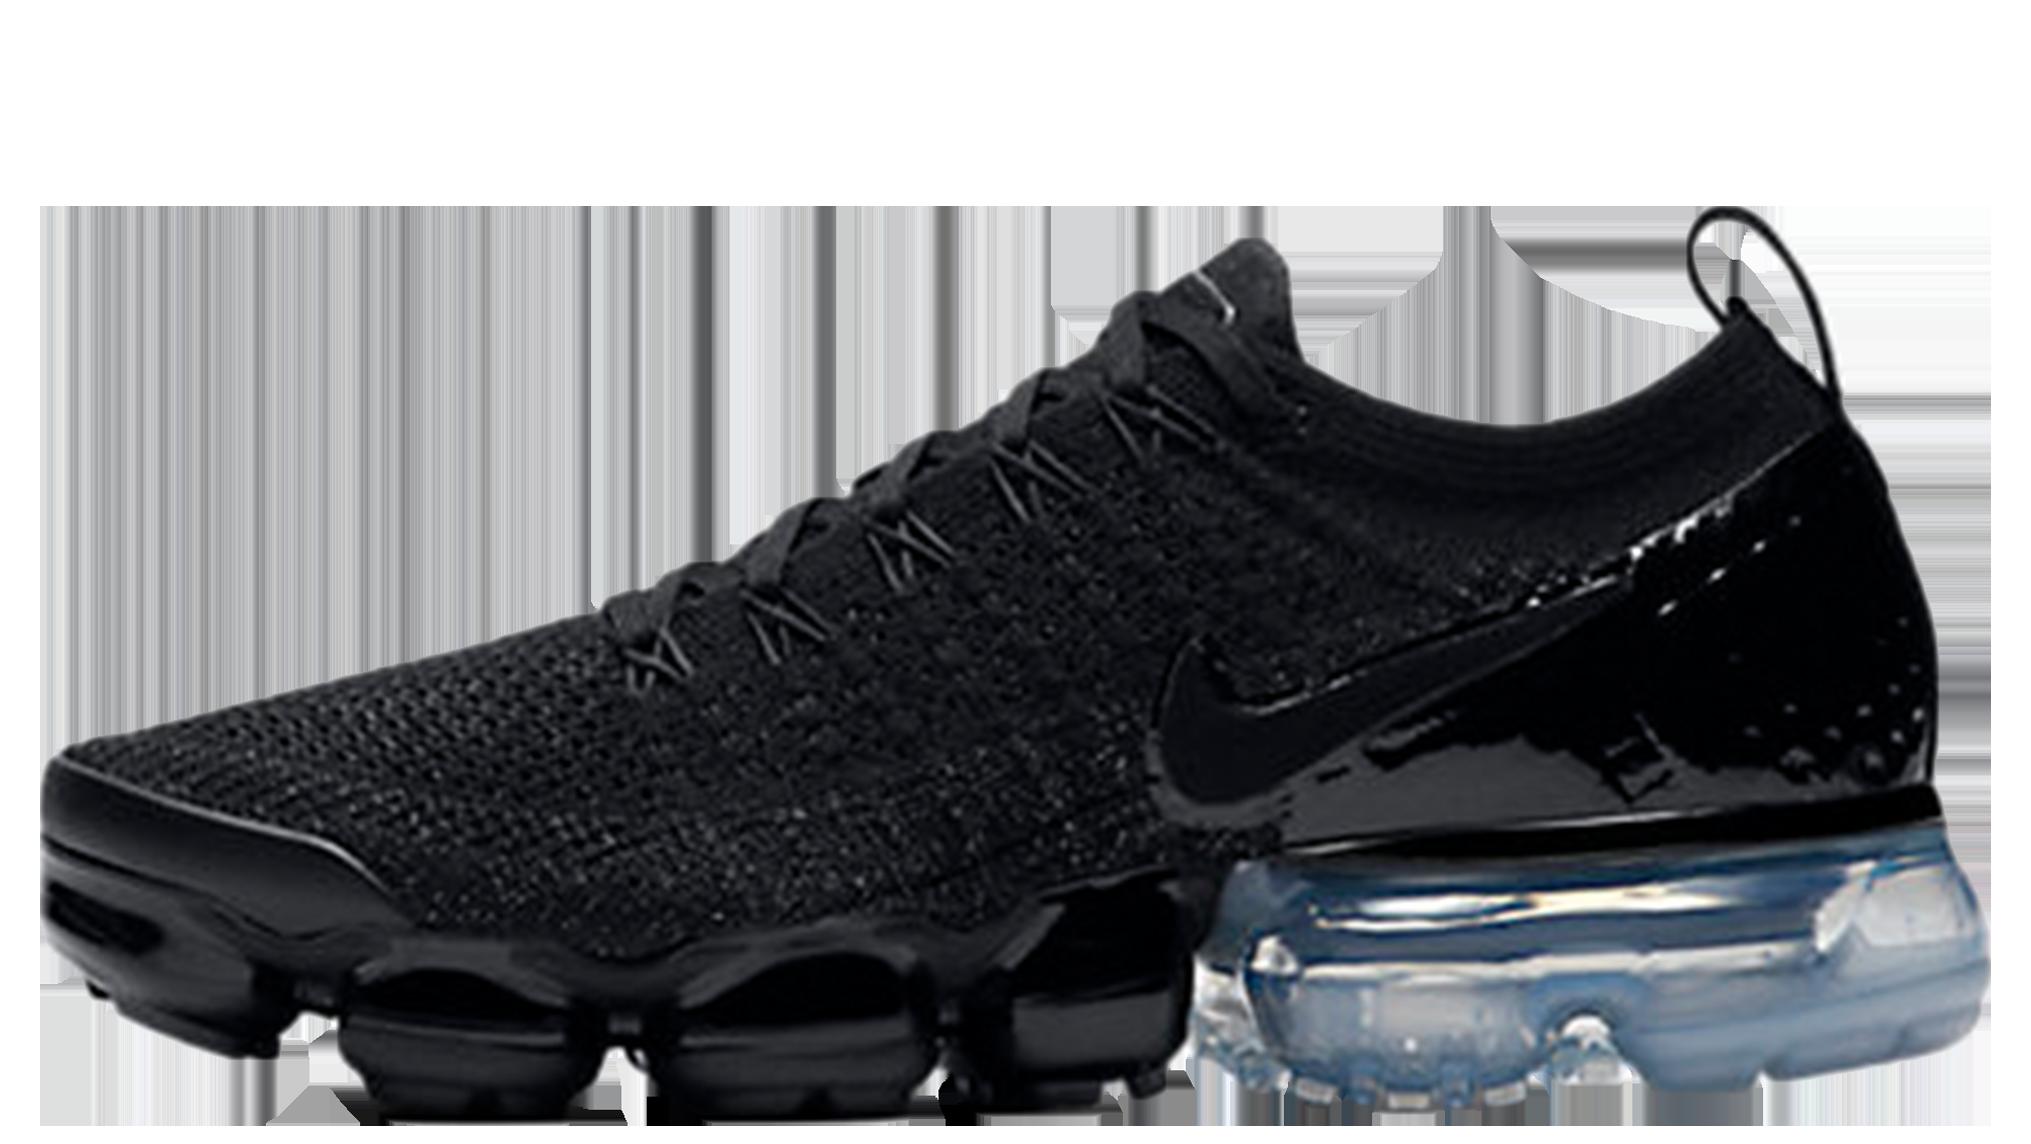 sports shoes ff8ce 8c4ea Nike Air VaporMax Flyknit 2 Black Metallic Silver   942843-014